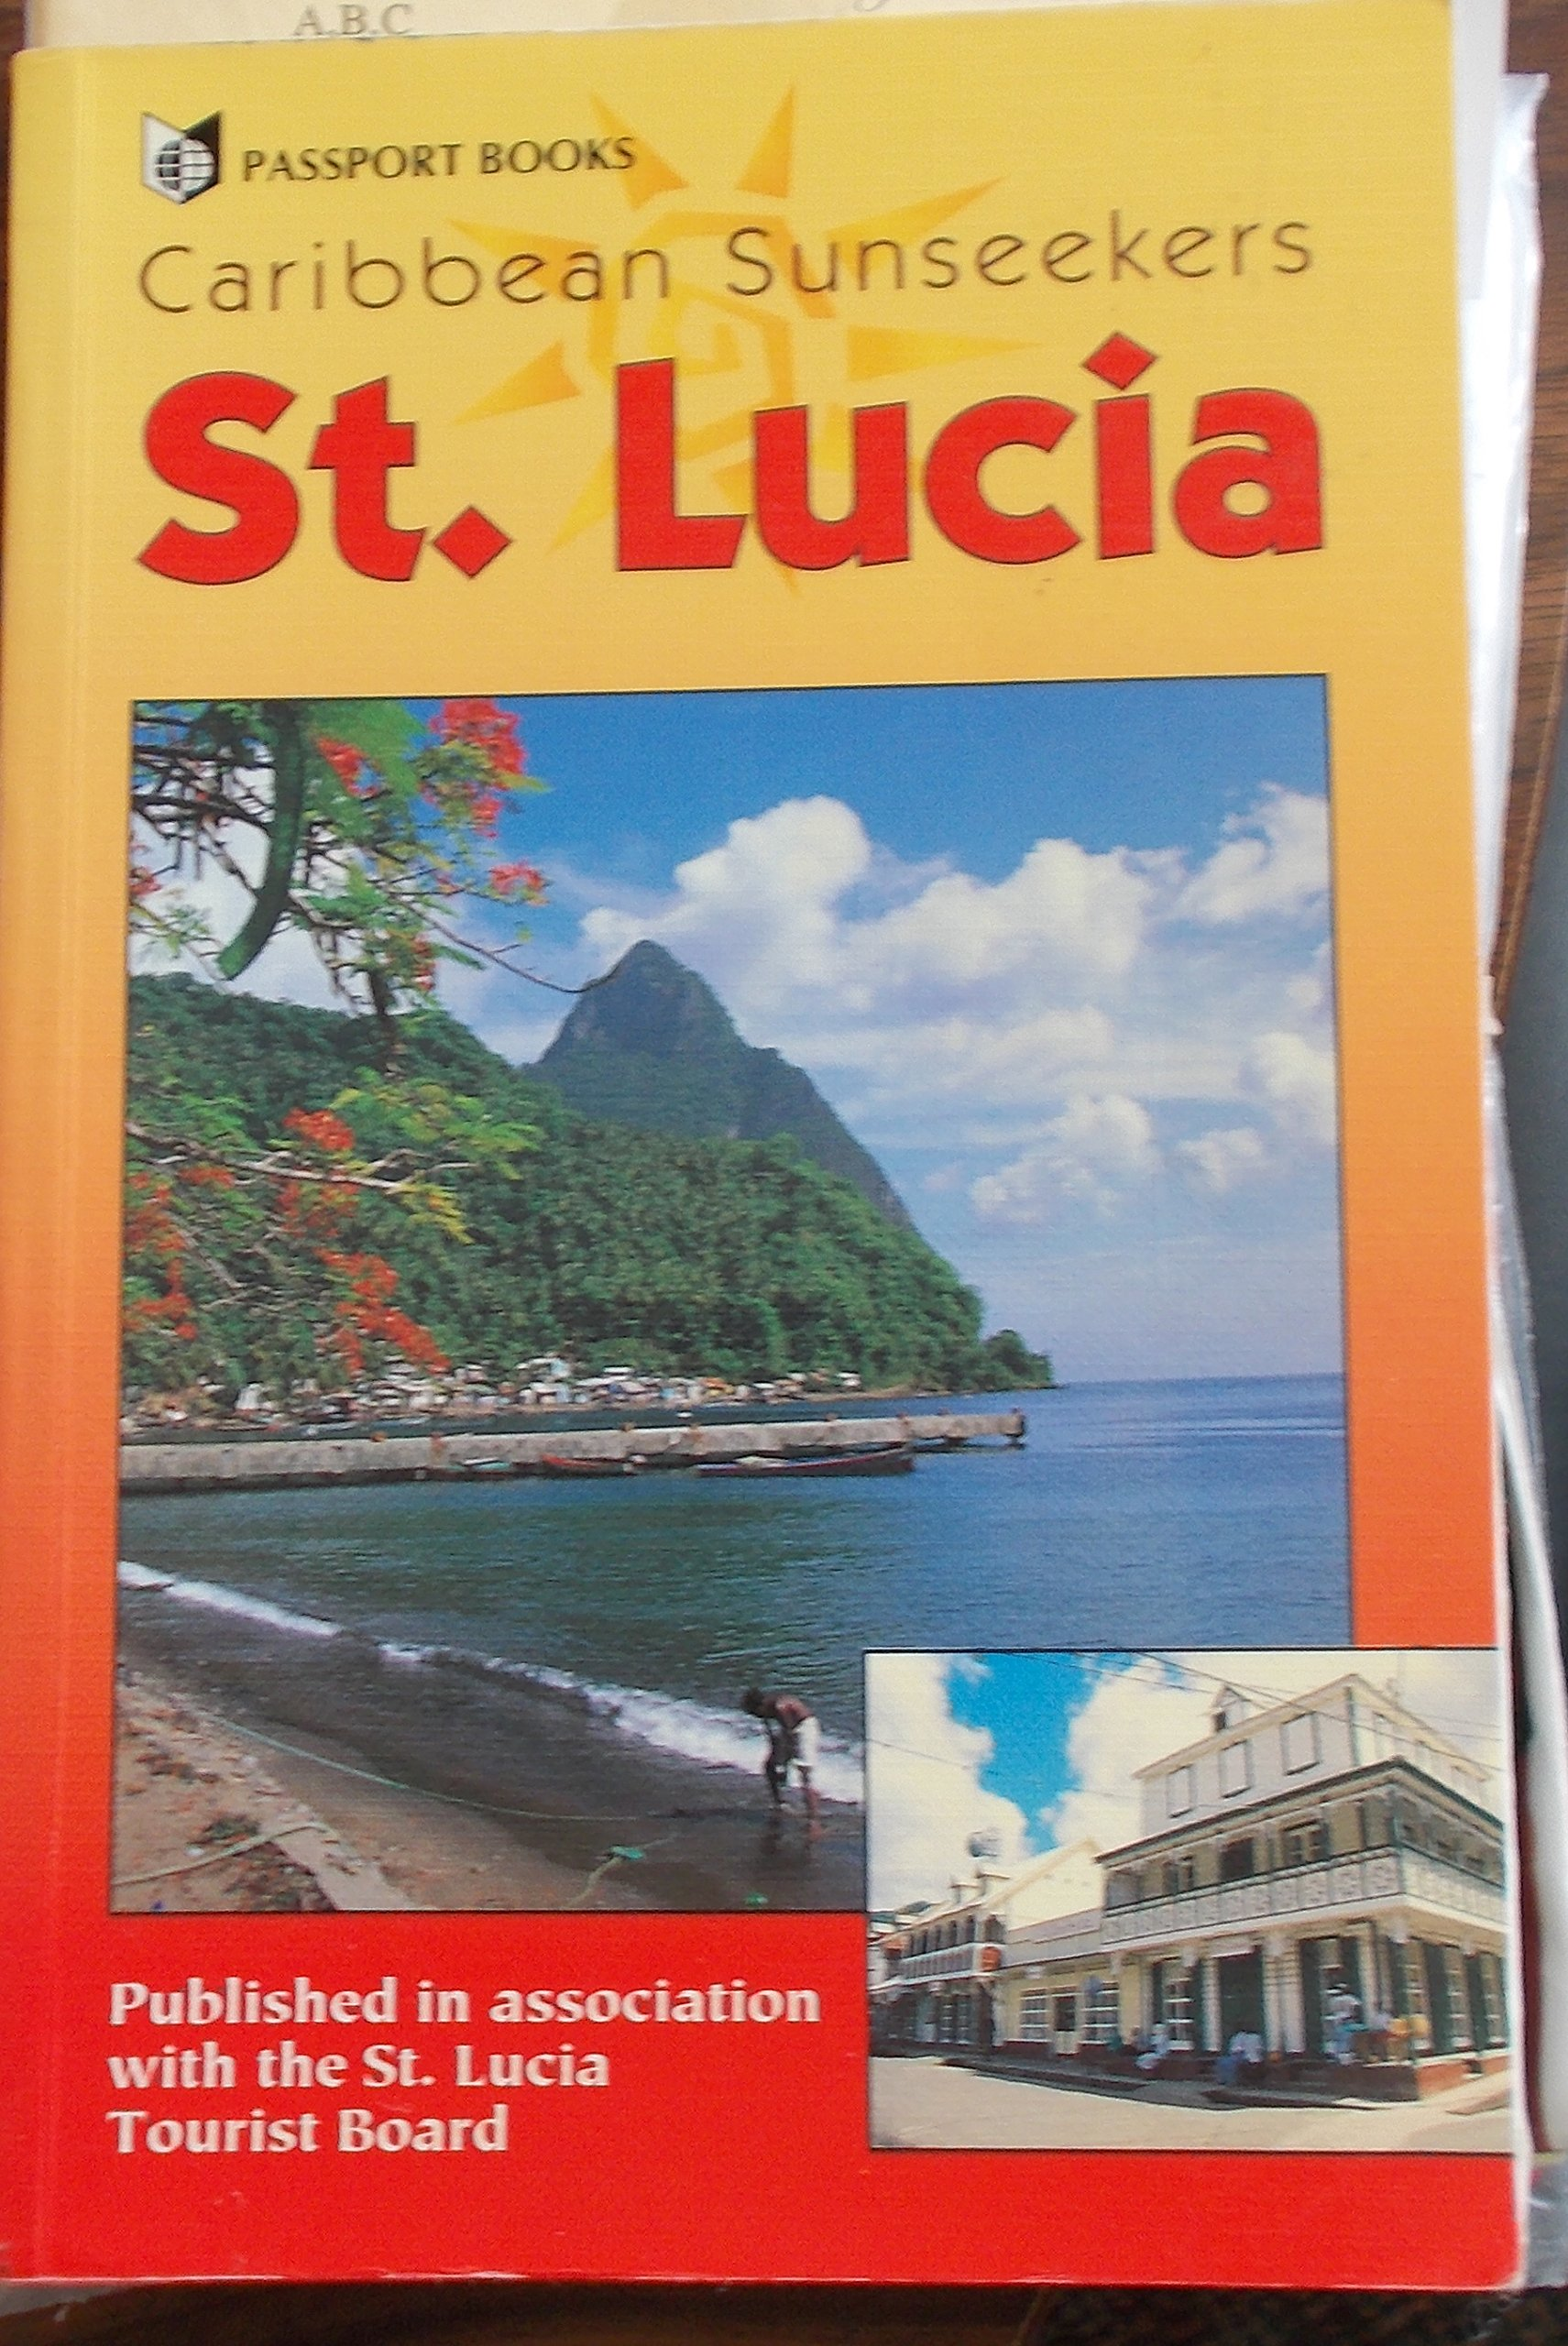 St. Lucia (ST LUCIA (PASSPORT BOOKS)) Paperback – March 1, 1996 Don Philpott 0844249270 Europe - Italy Saint Lucia; Guidebooks.